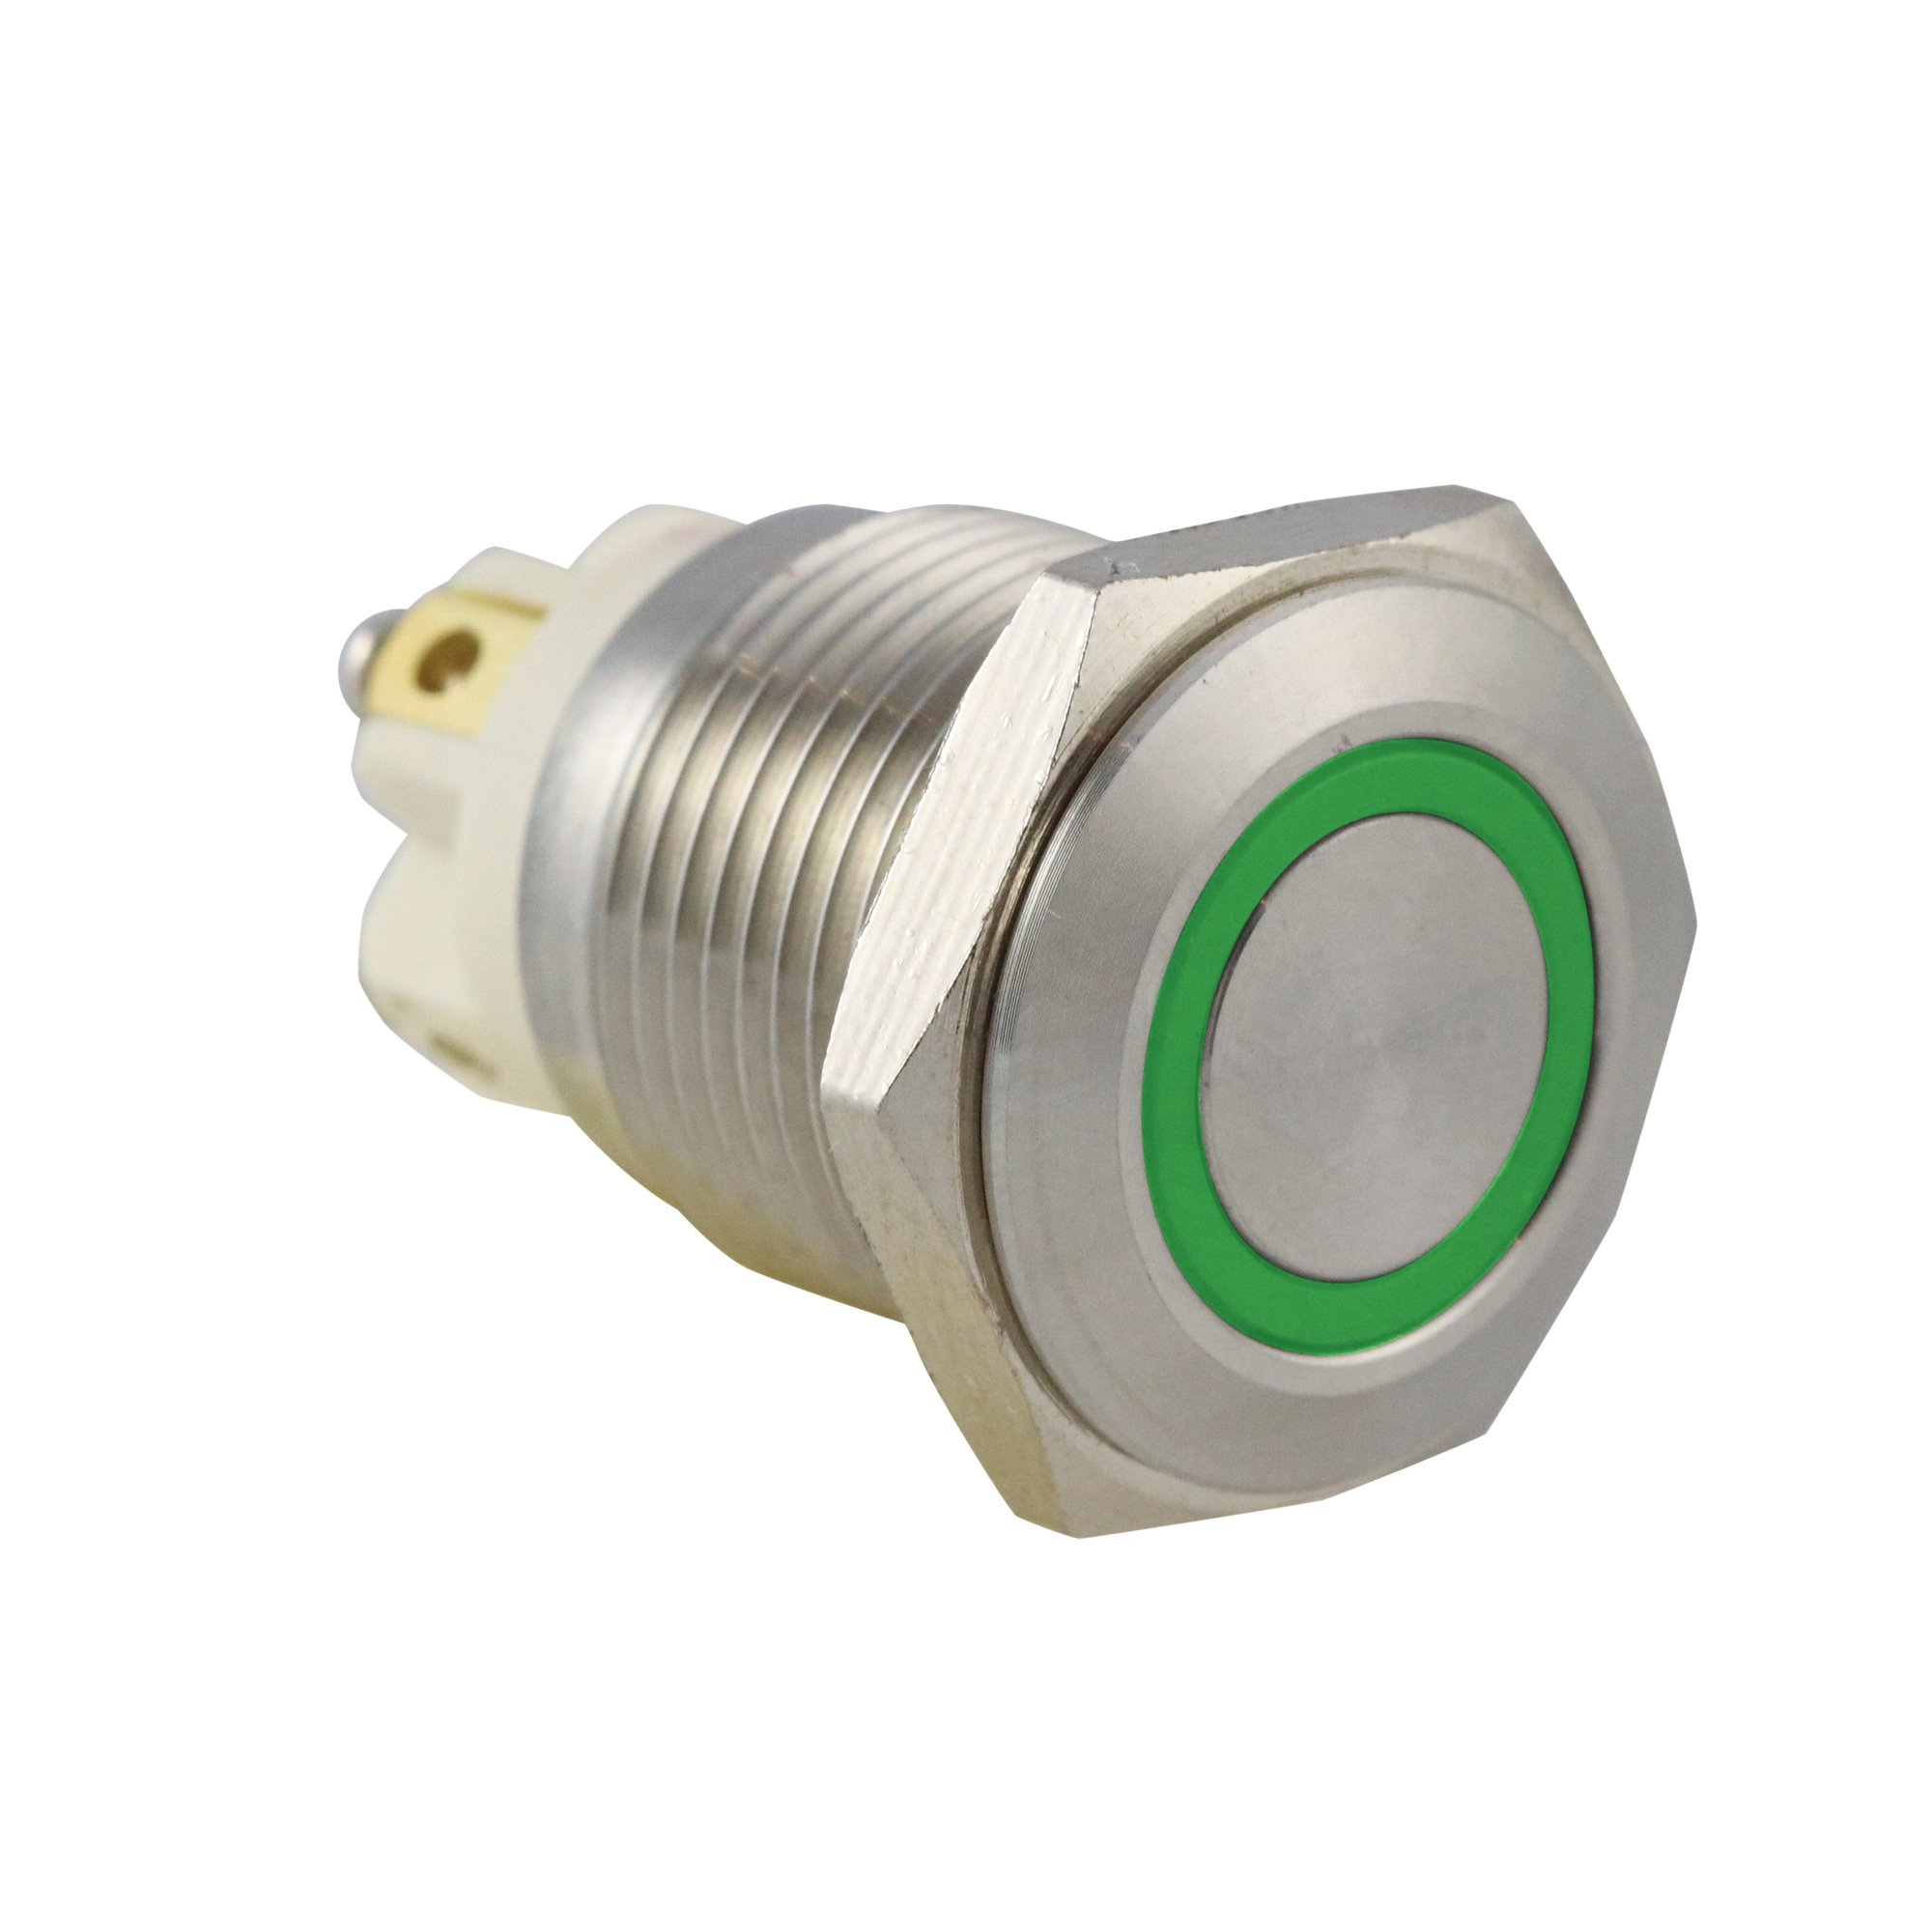 Green Ring IP65 Push Button Switch - AB-AV-1619